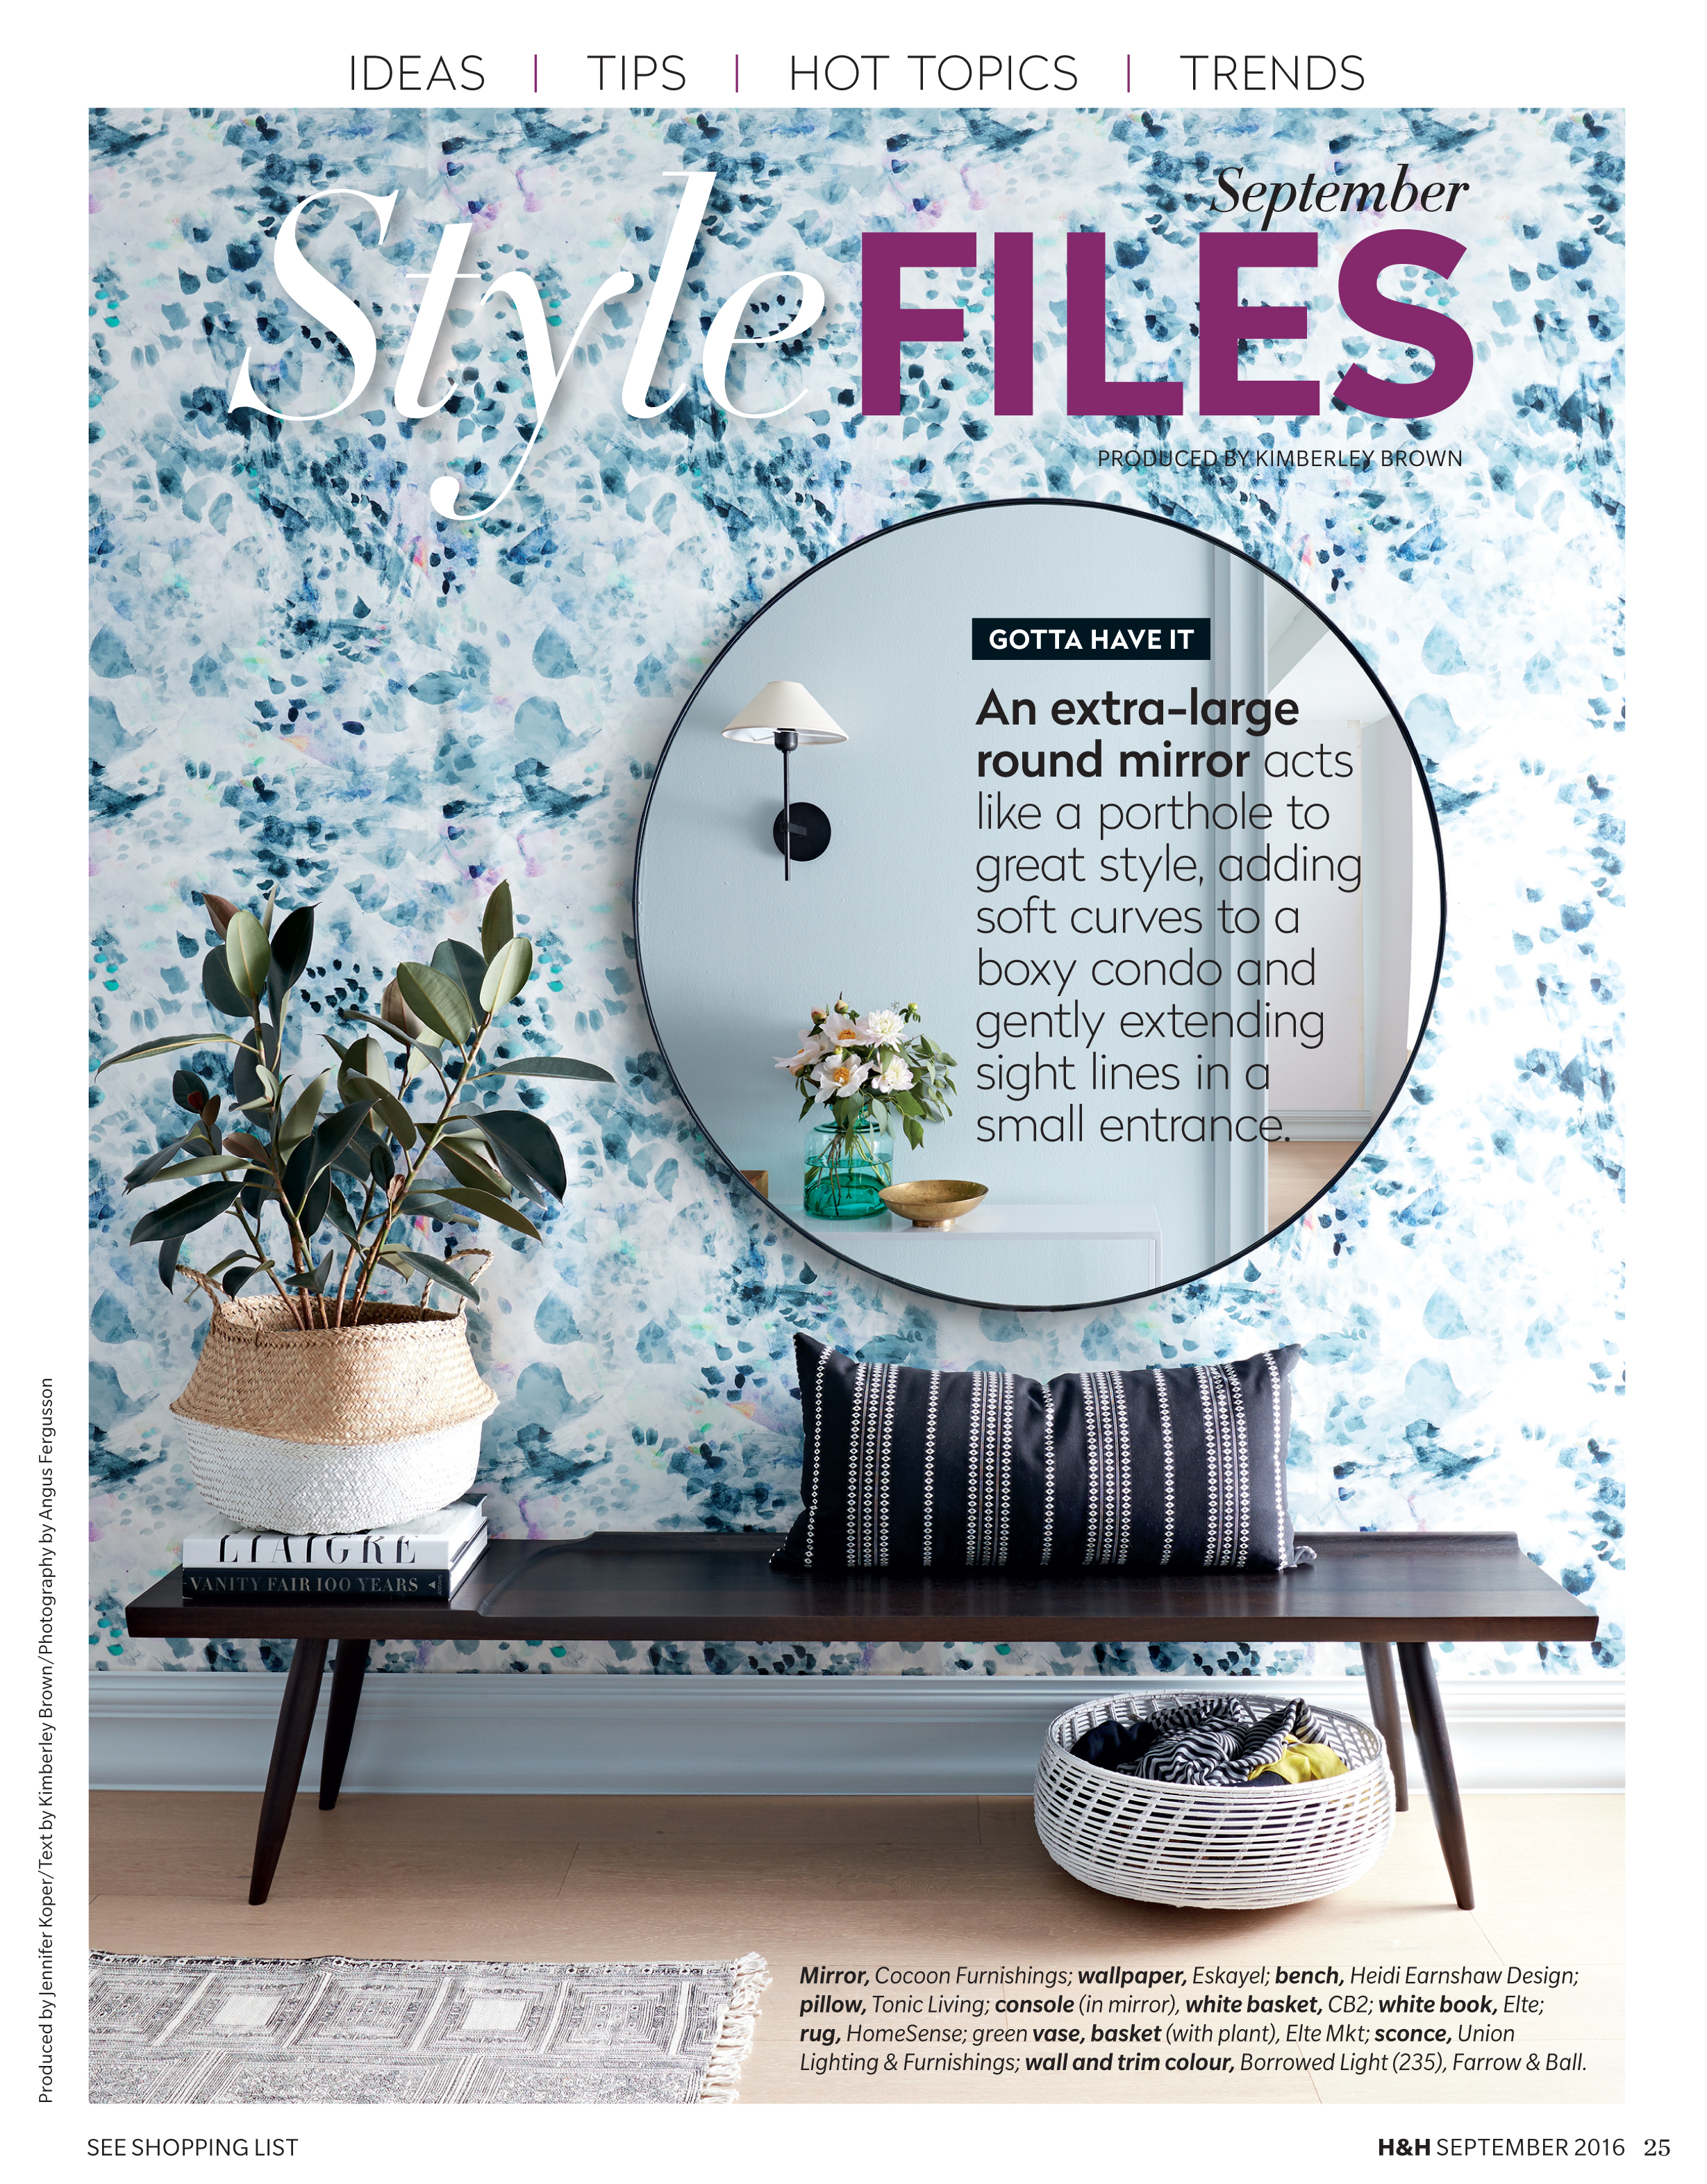 In the Press - Designs by Briana DeVoe have been featured in House & Home Magazine, WSJ Magazine, Design Milk, Design Sponge, Martha Stewart Living and Elle.HR